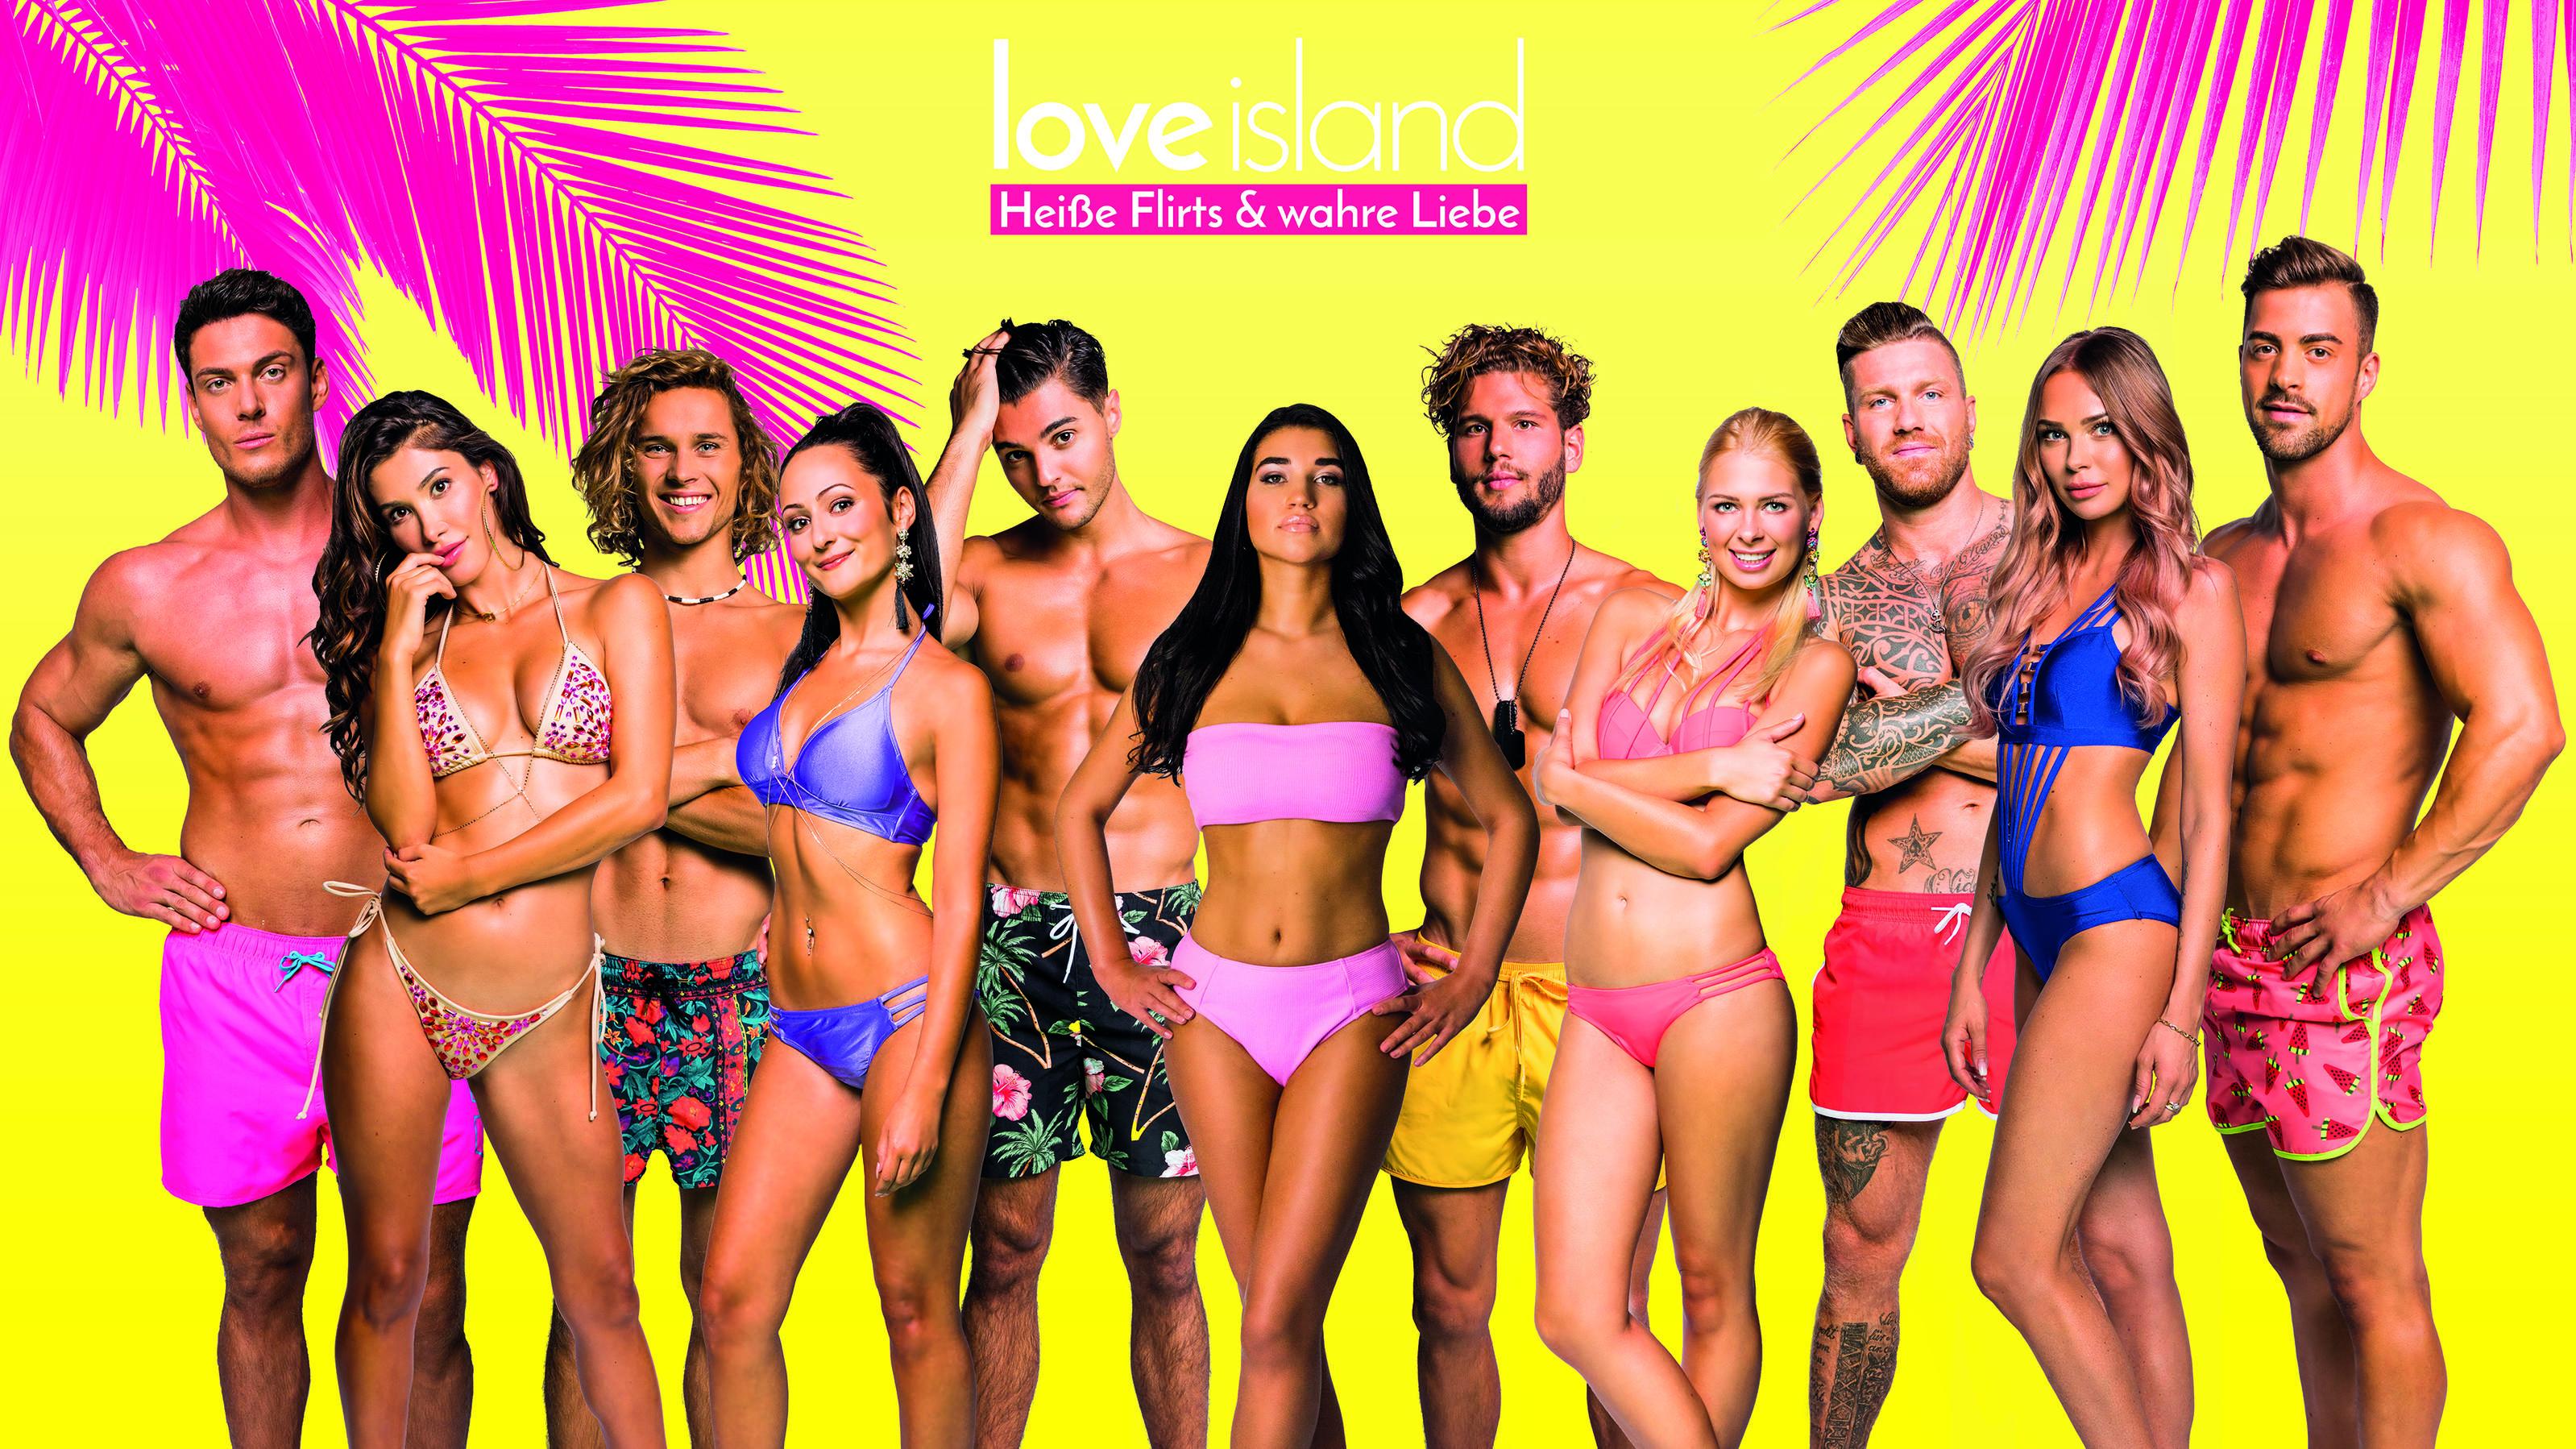 Love Island Folge